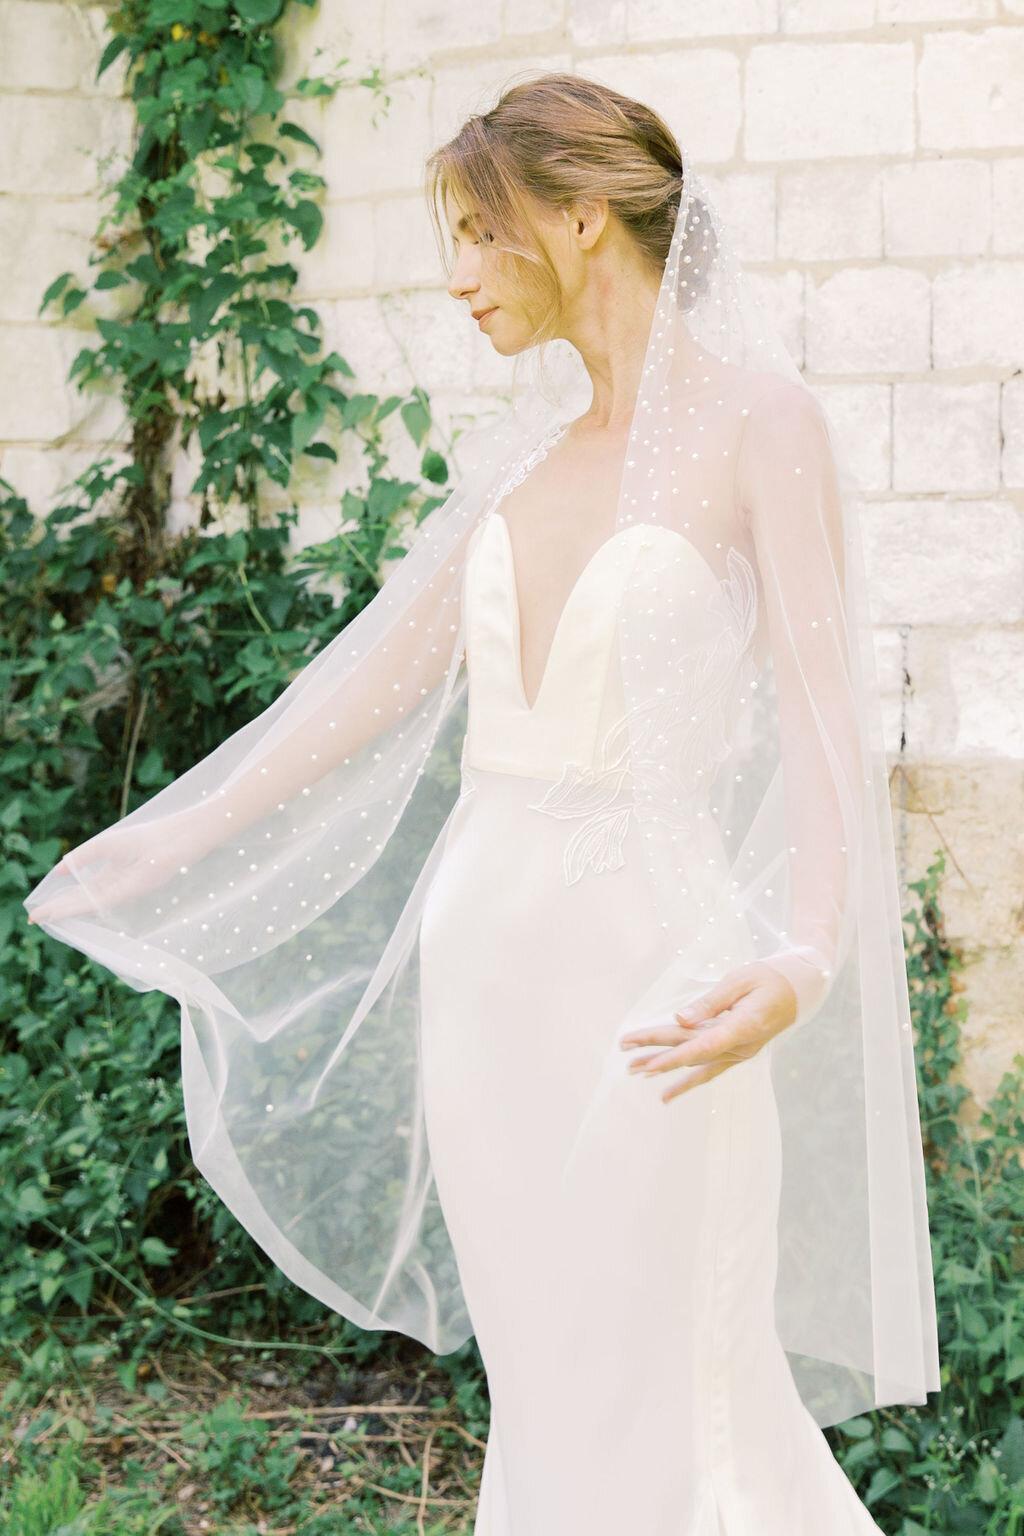 Wedding_Veil_Madame_Tulle_Amelia_Soegijono0015.JPG